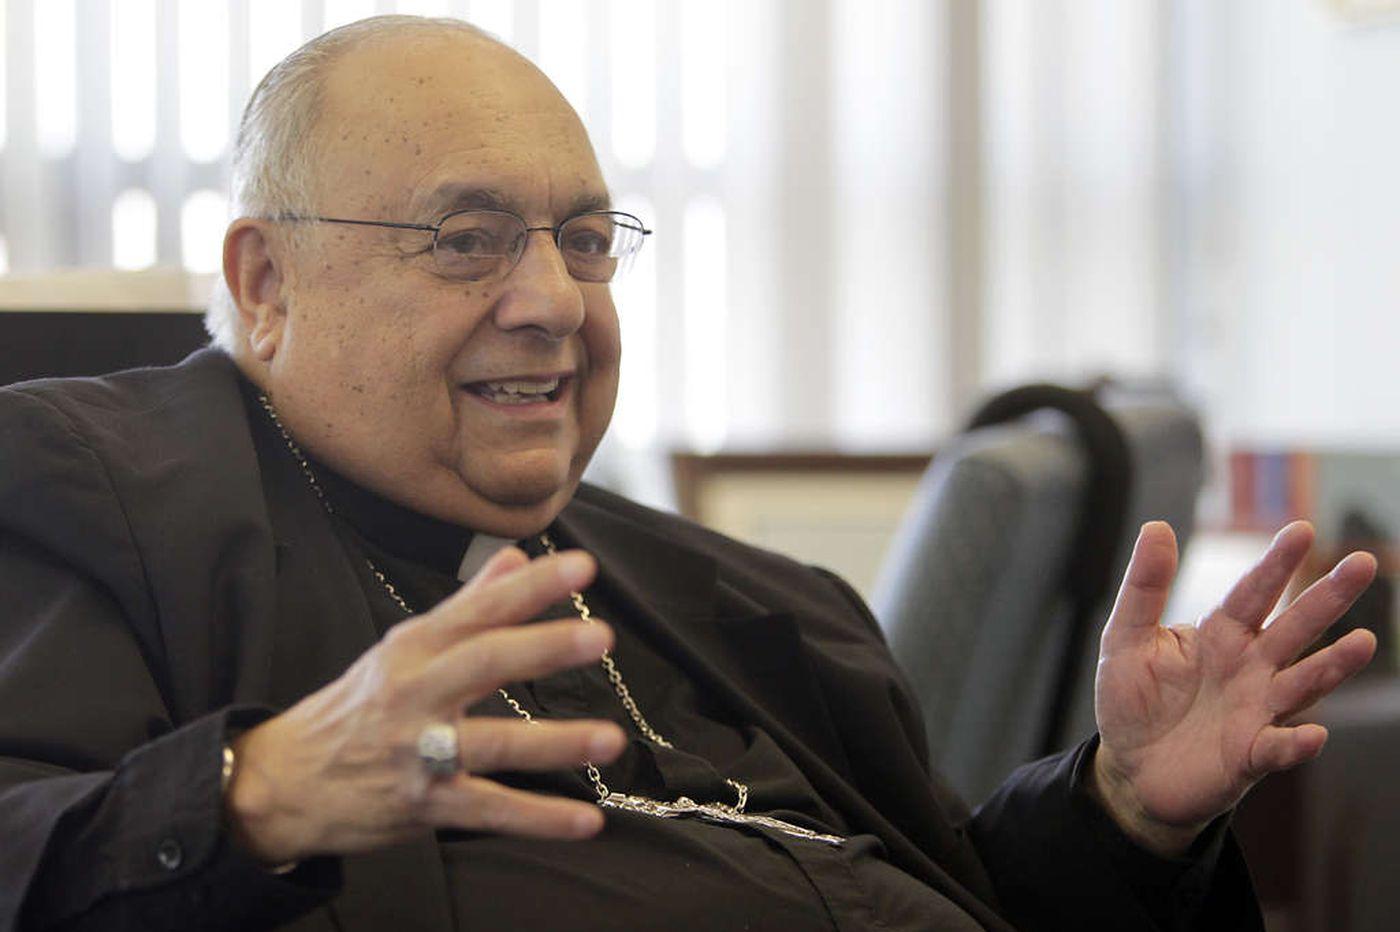 Bishop Joseph Galante, 80, led Diocese of Camden